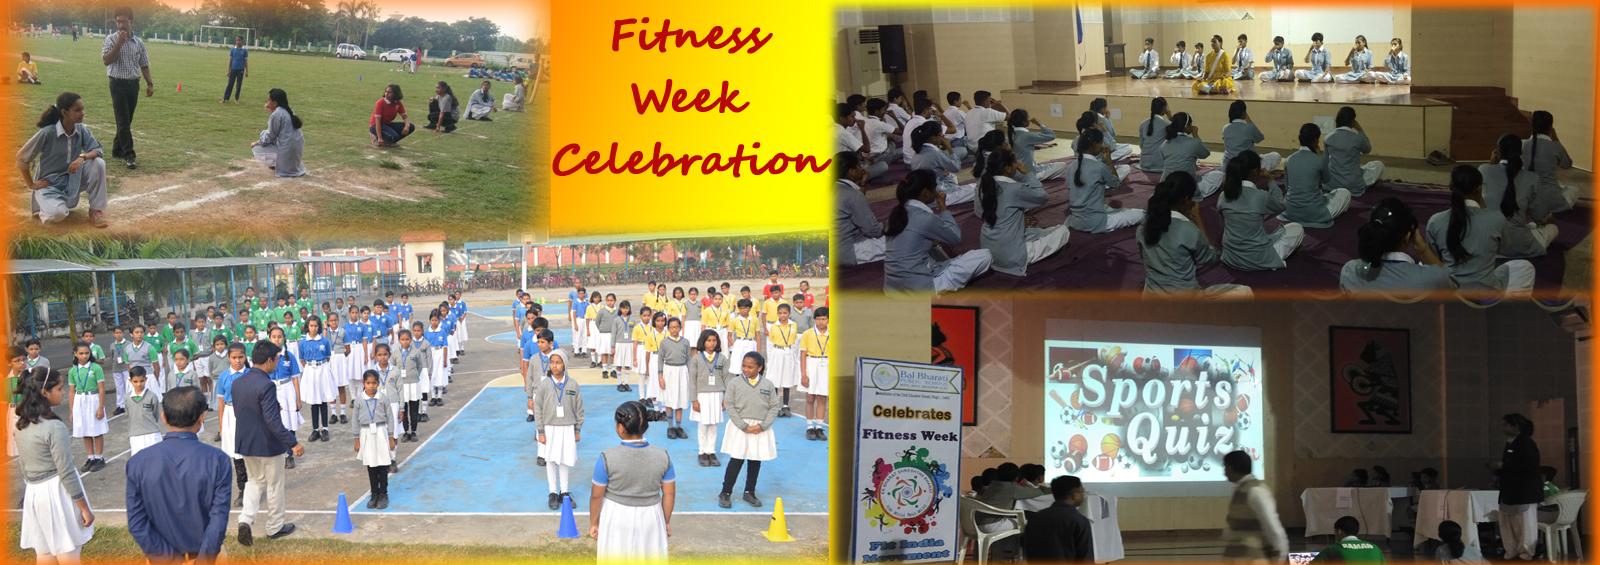 Fitness week